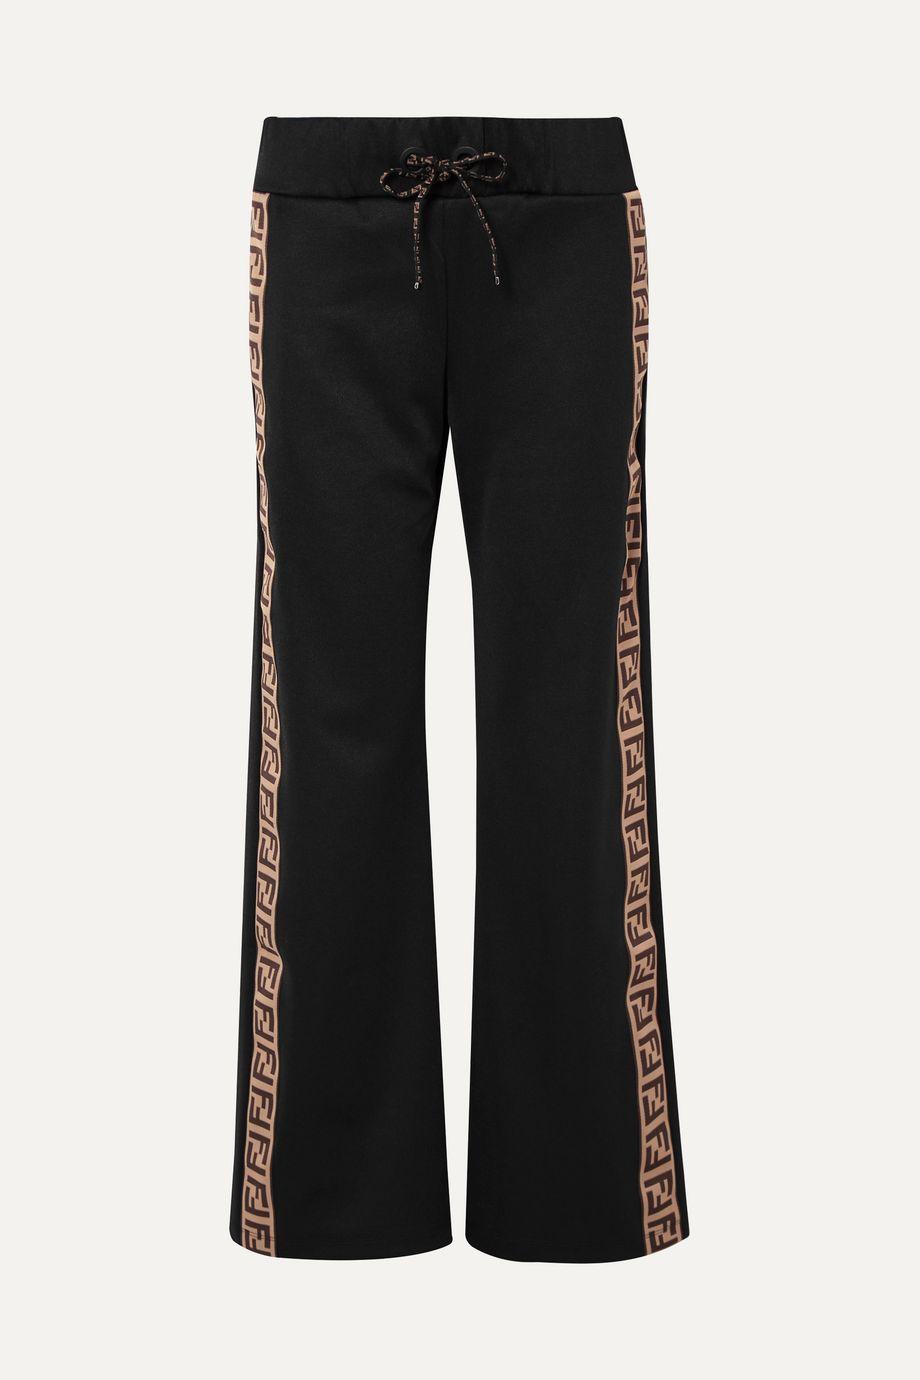 Fendi Fendirama jacquard-trimmed satin-jersey track pants